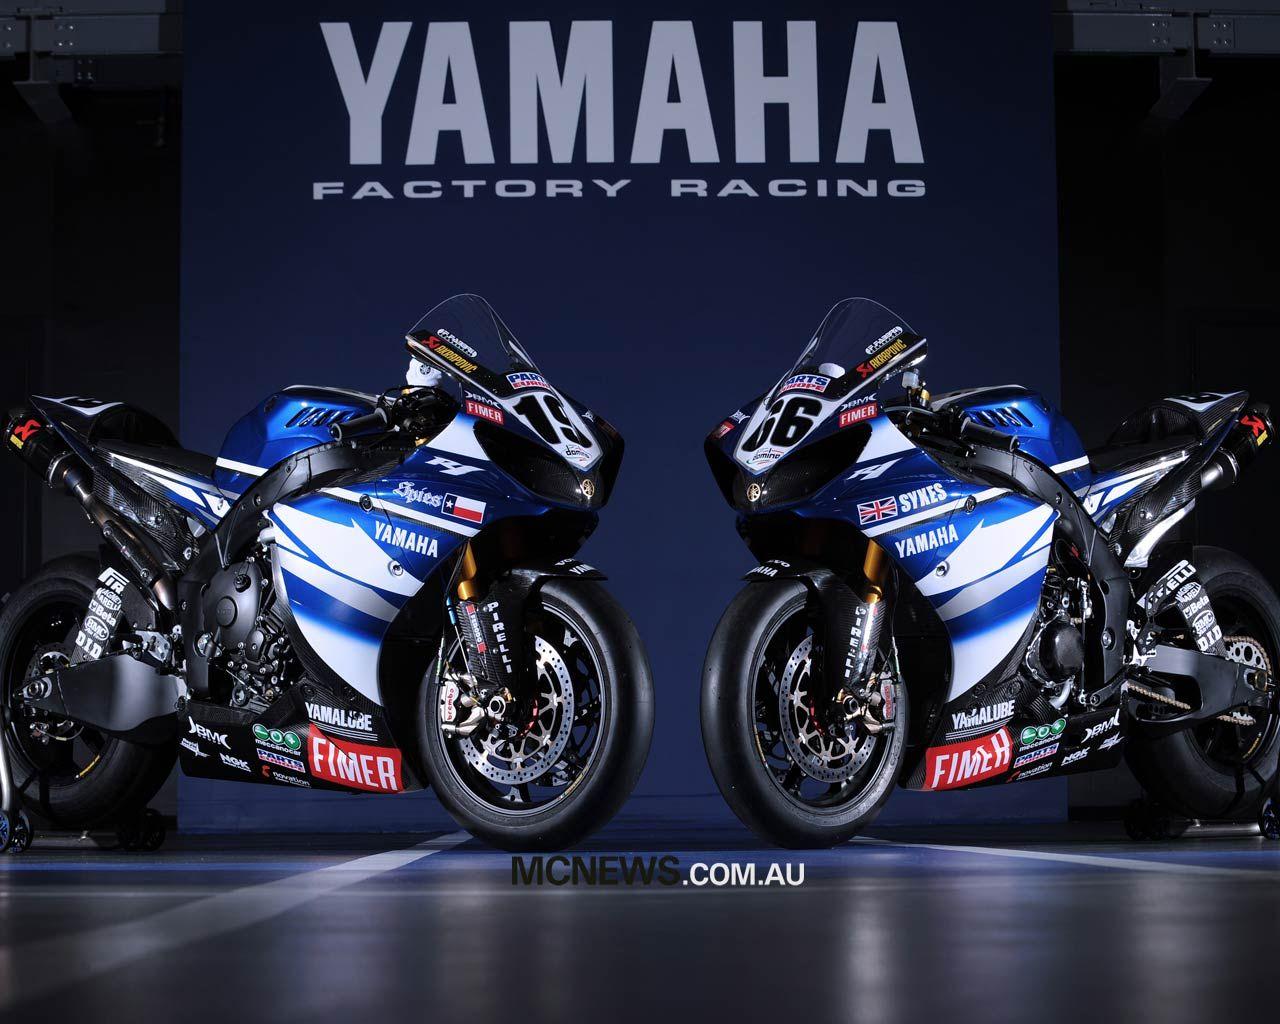 Hd wallpaper yamaha r1 - Yamaha Bikes R1 Wallpaper Laptop Backgrounds Http Wallatar Com Wp